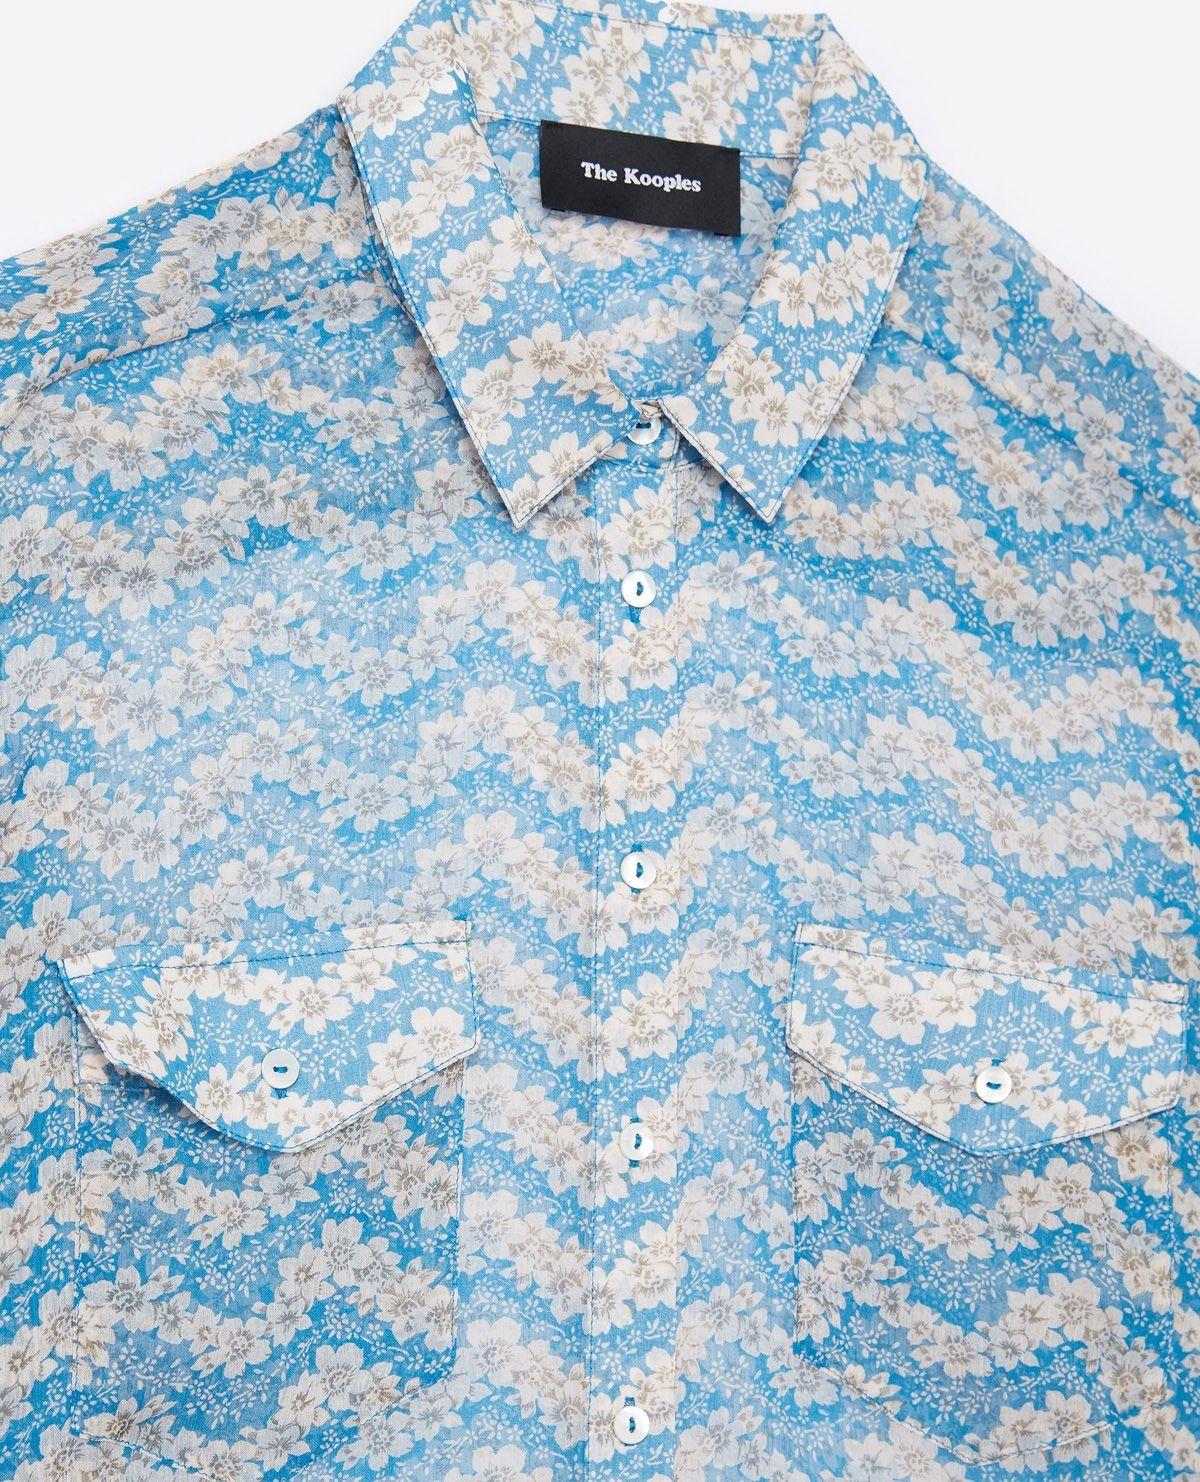 9753dabe91 Blue Jasmine printed silk shirt - THE KOOPLES. Blue Jasmine printed silk  shirt - THE KOOPLES Sale ...